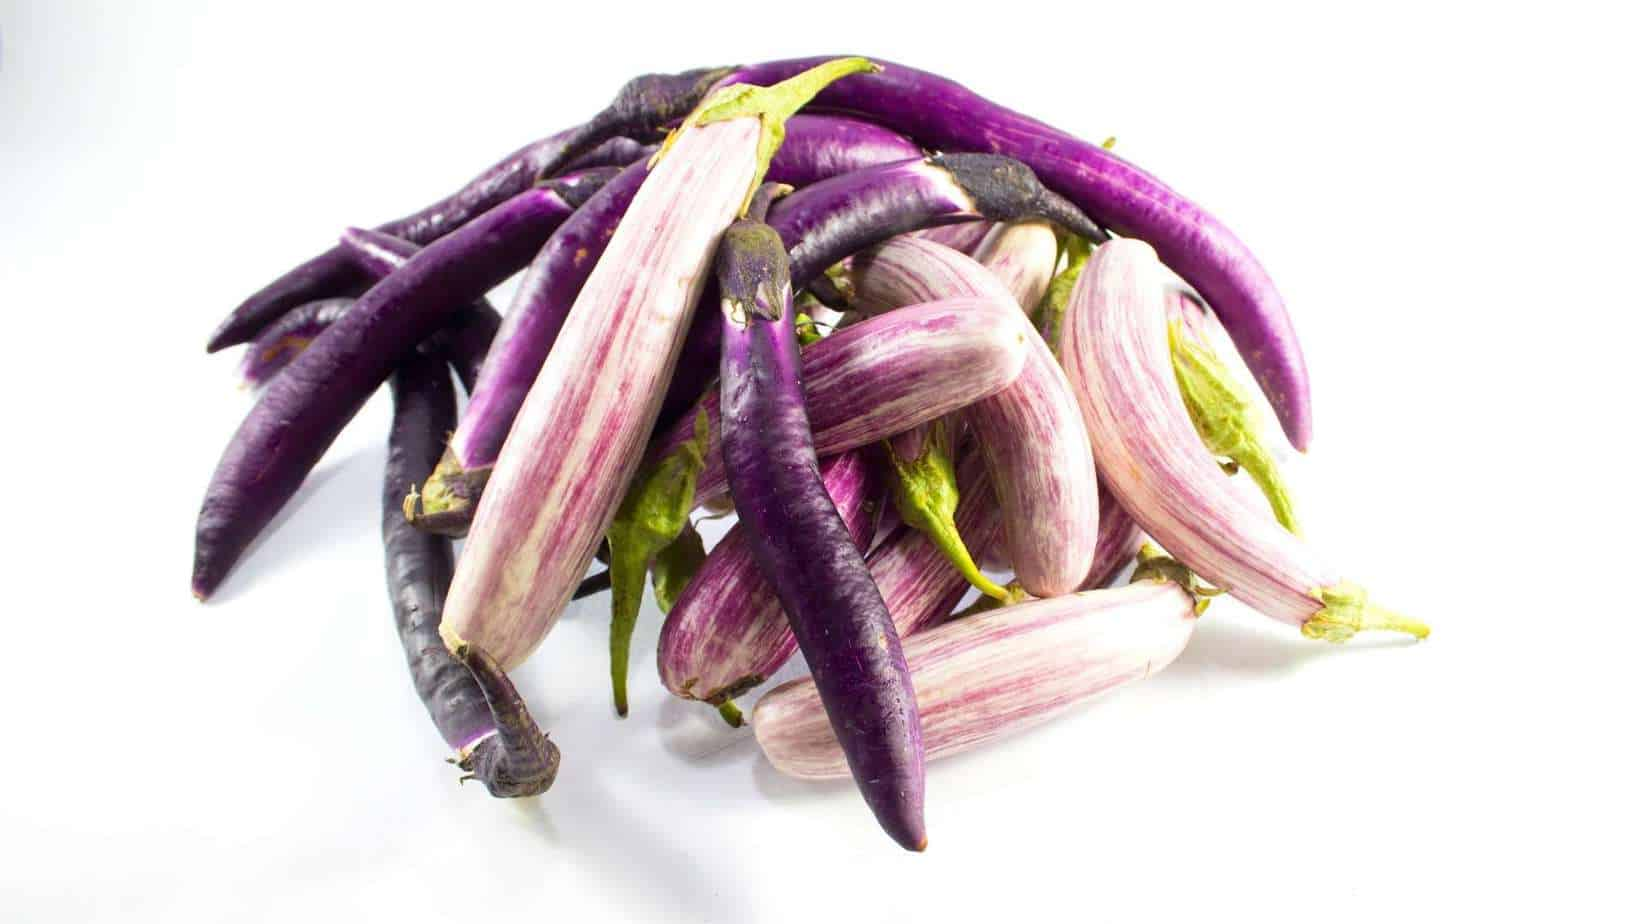 Curled up eggplants